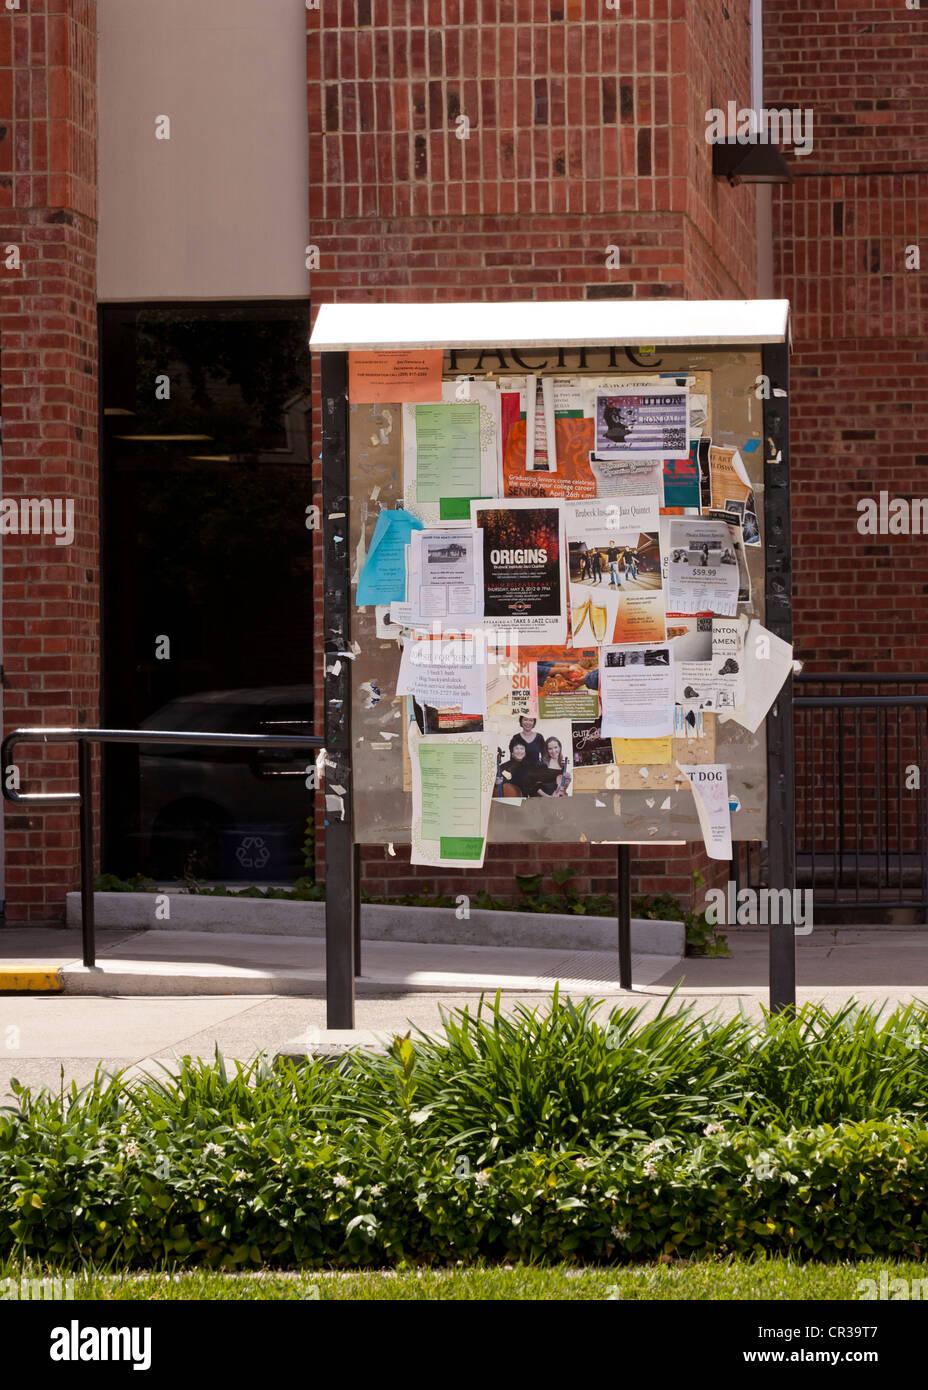 An outdoor bulletin board - Stock Image